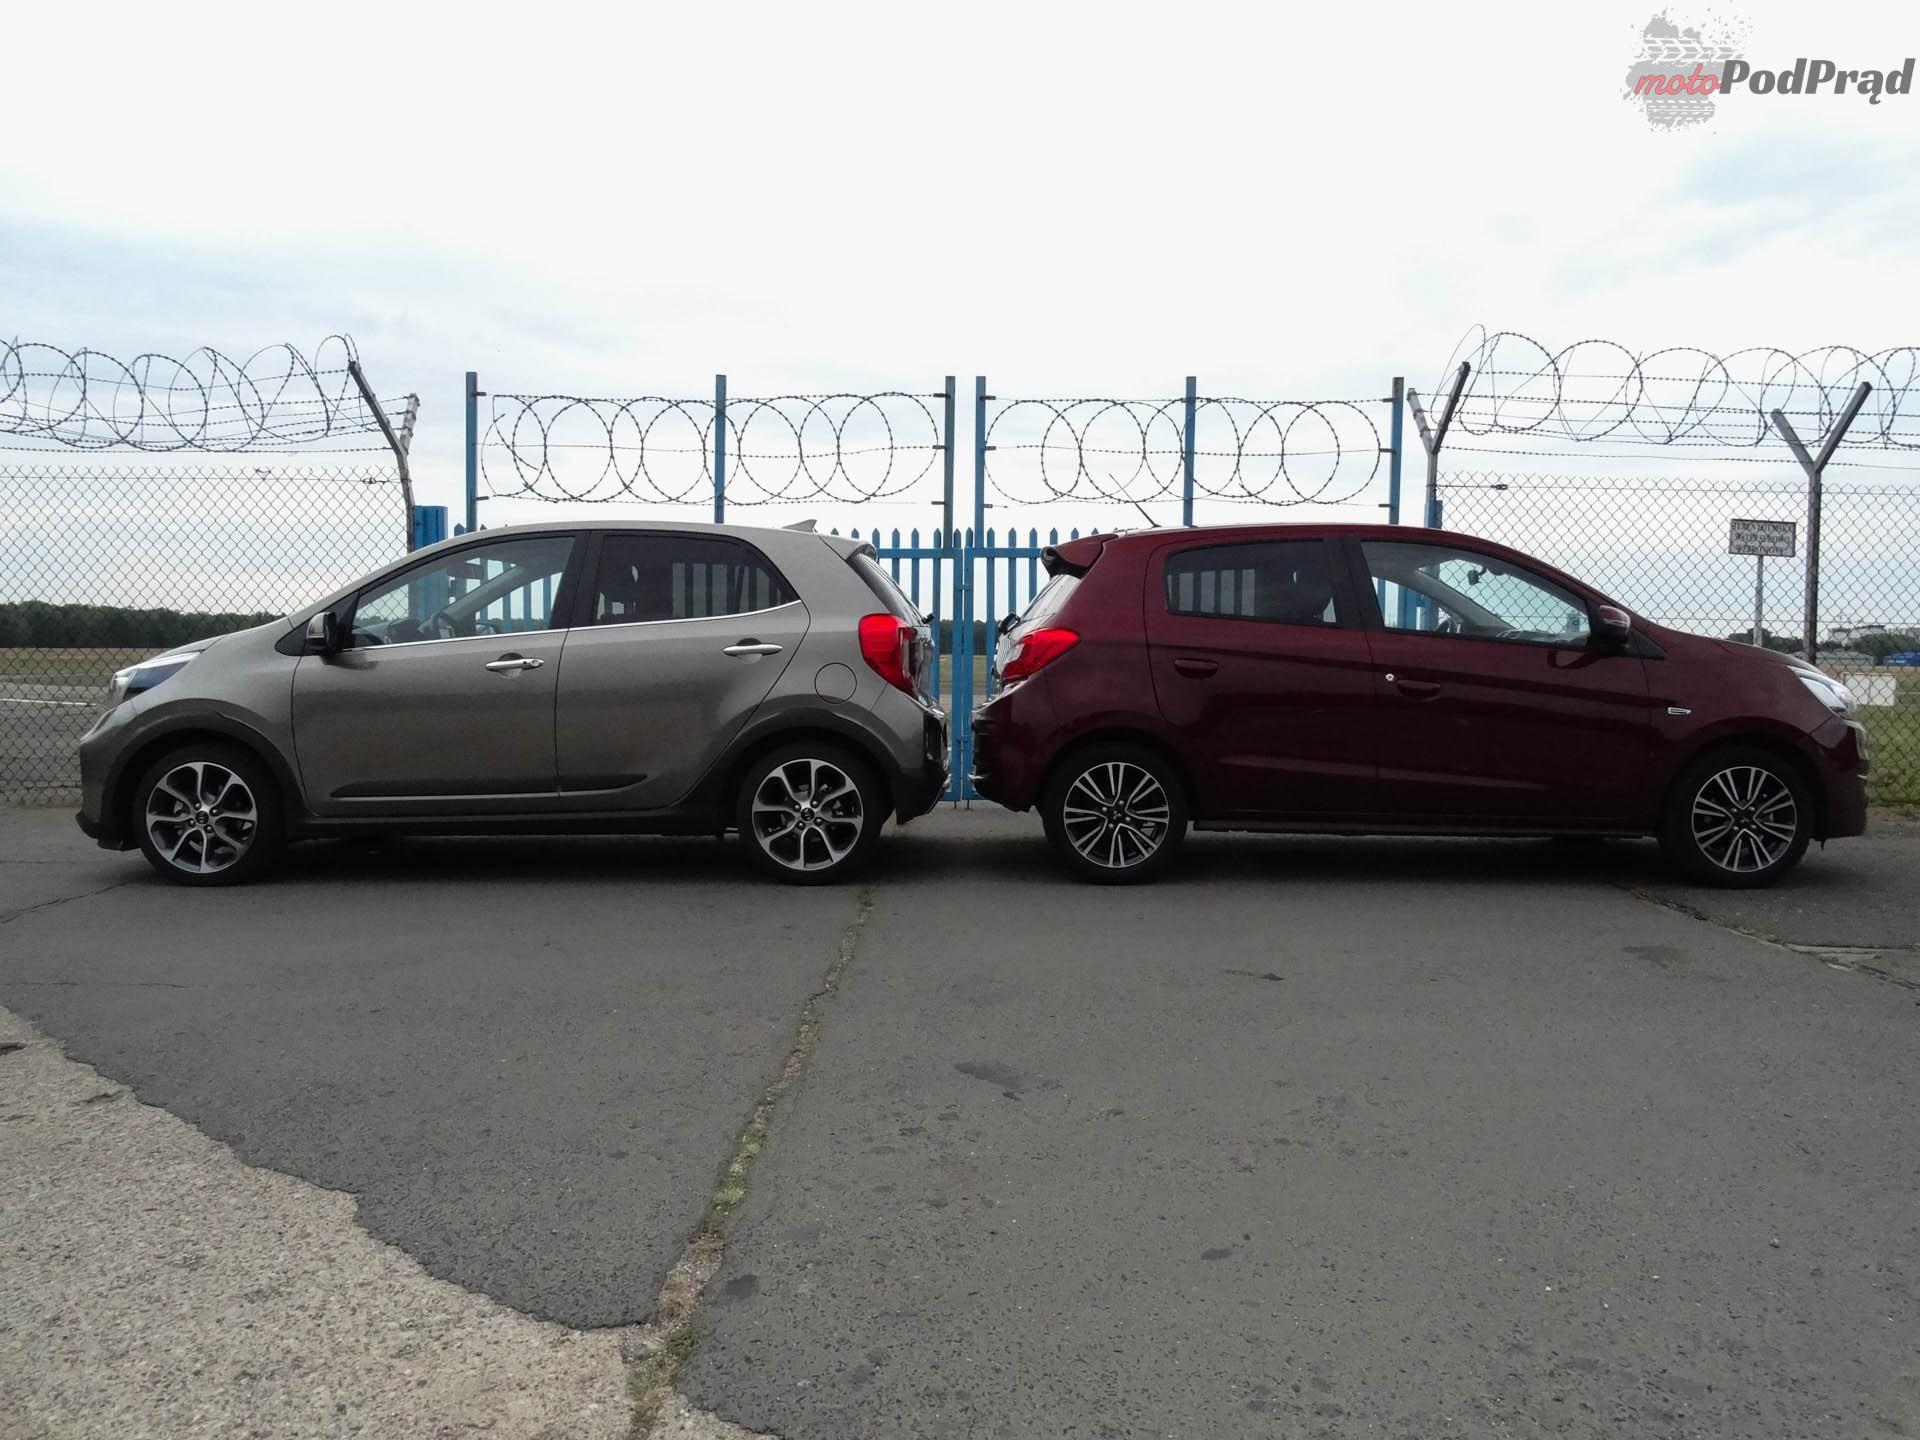 Kia Picanto vs Mitsubishi Space Star 8 Porównanie: Kia Picanto kontra Mitsubishi Space Star   dwa światy